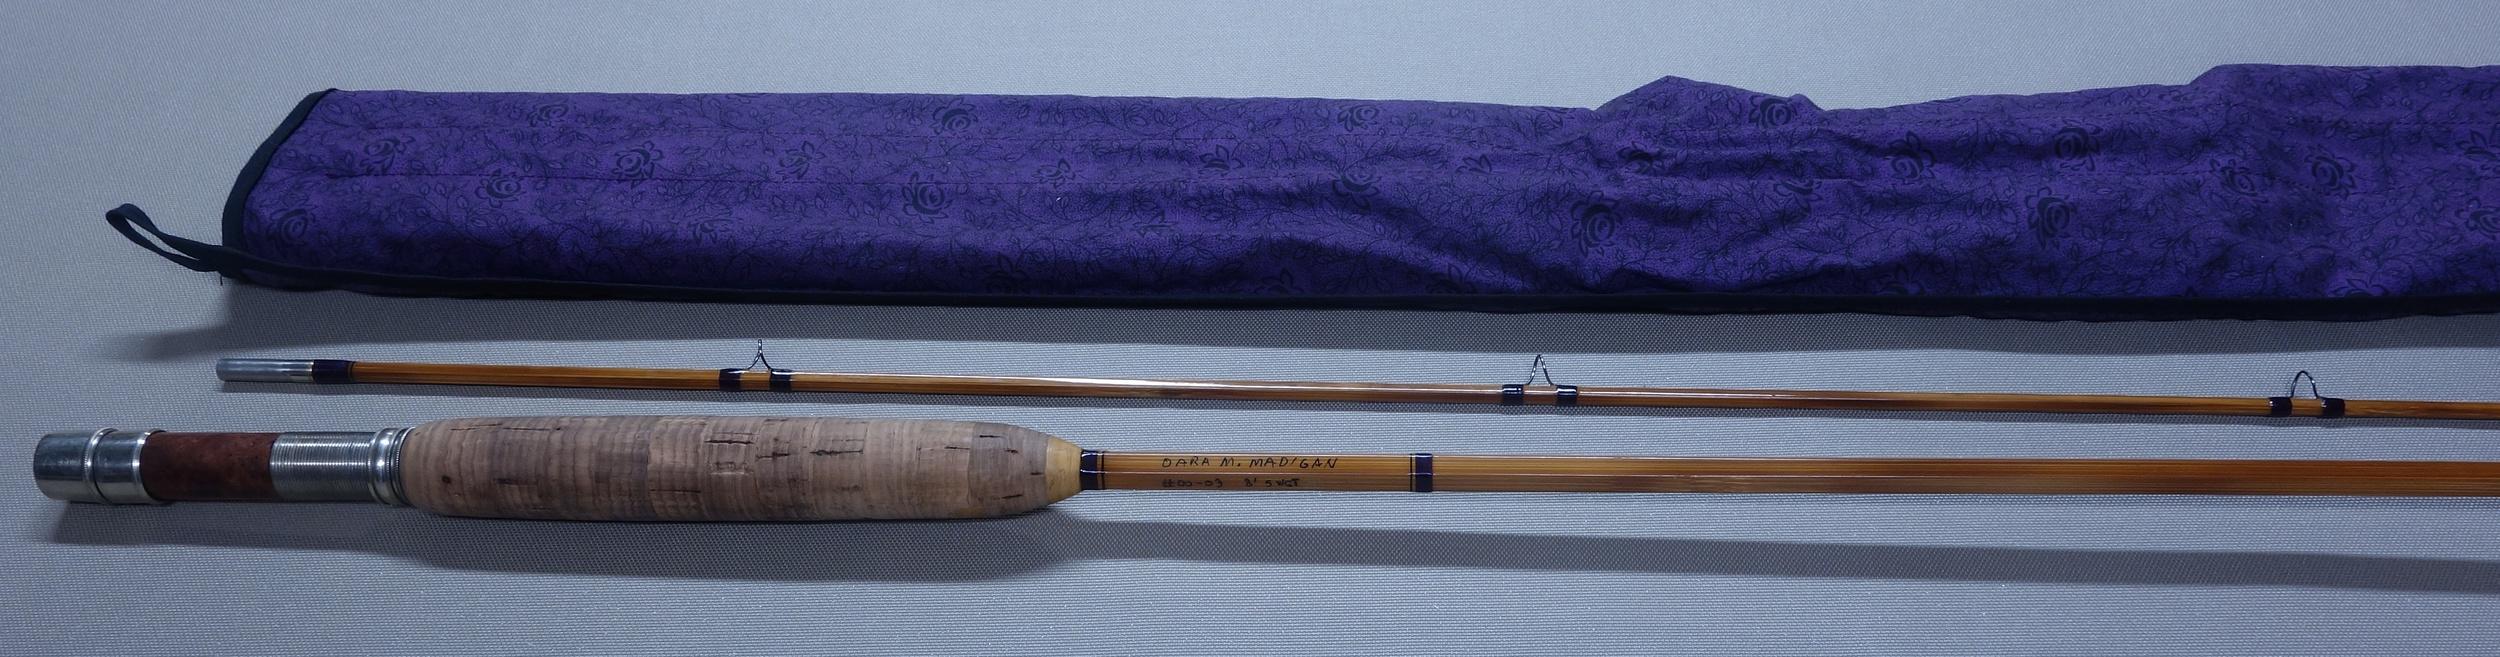 Naturally, Dara's rod has purple wraps and a purple bag.